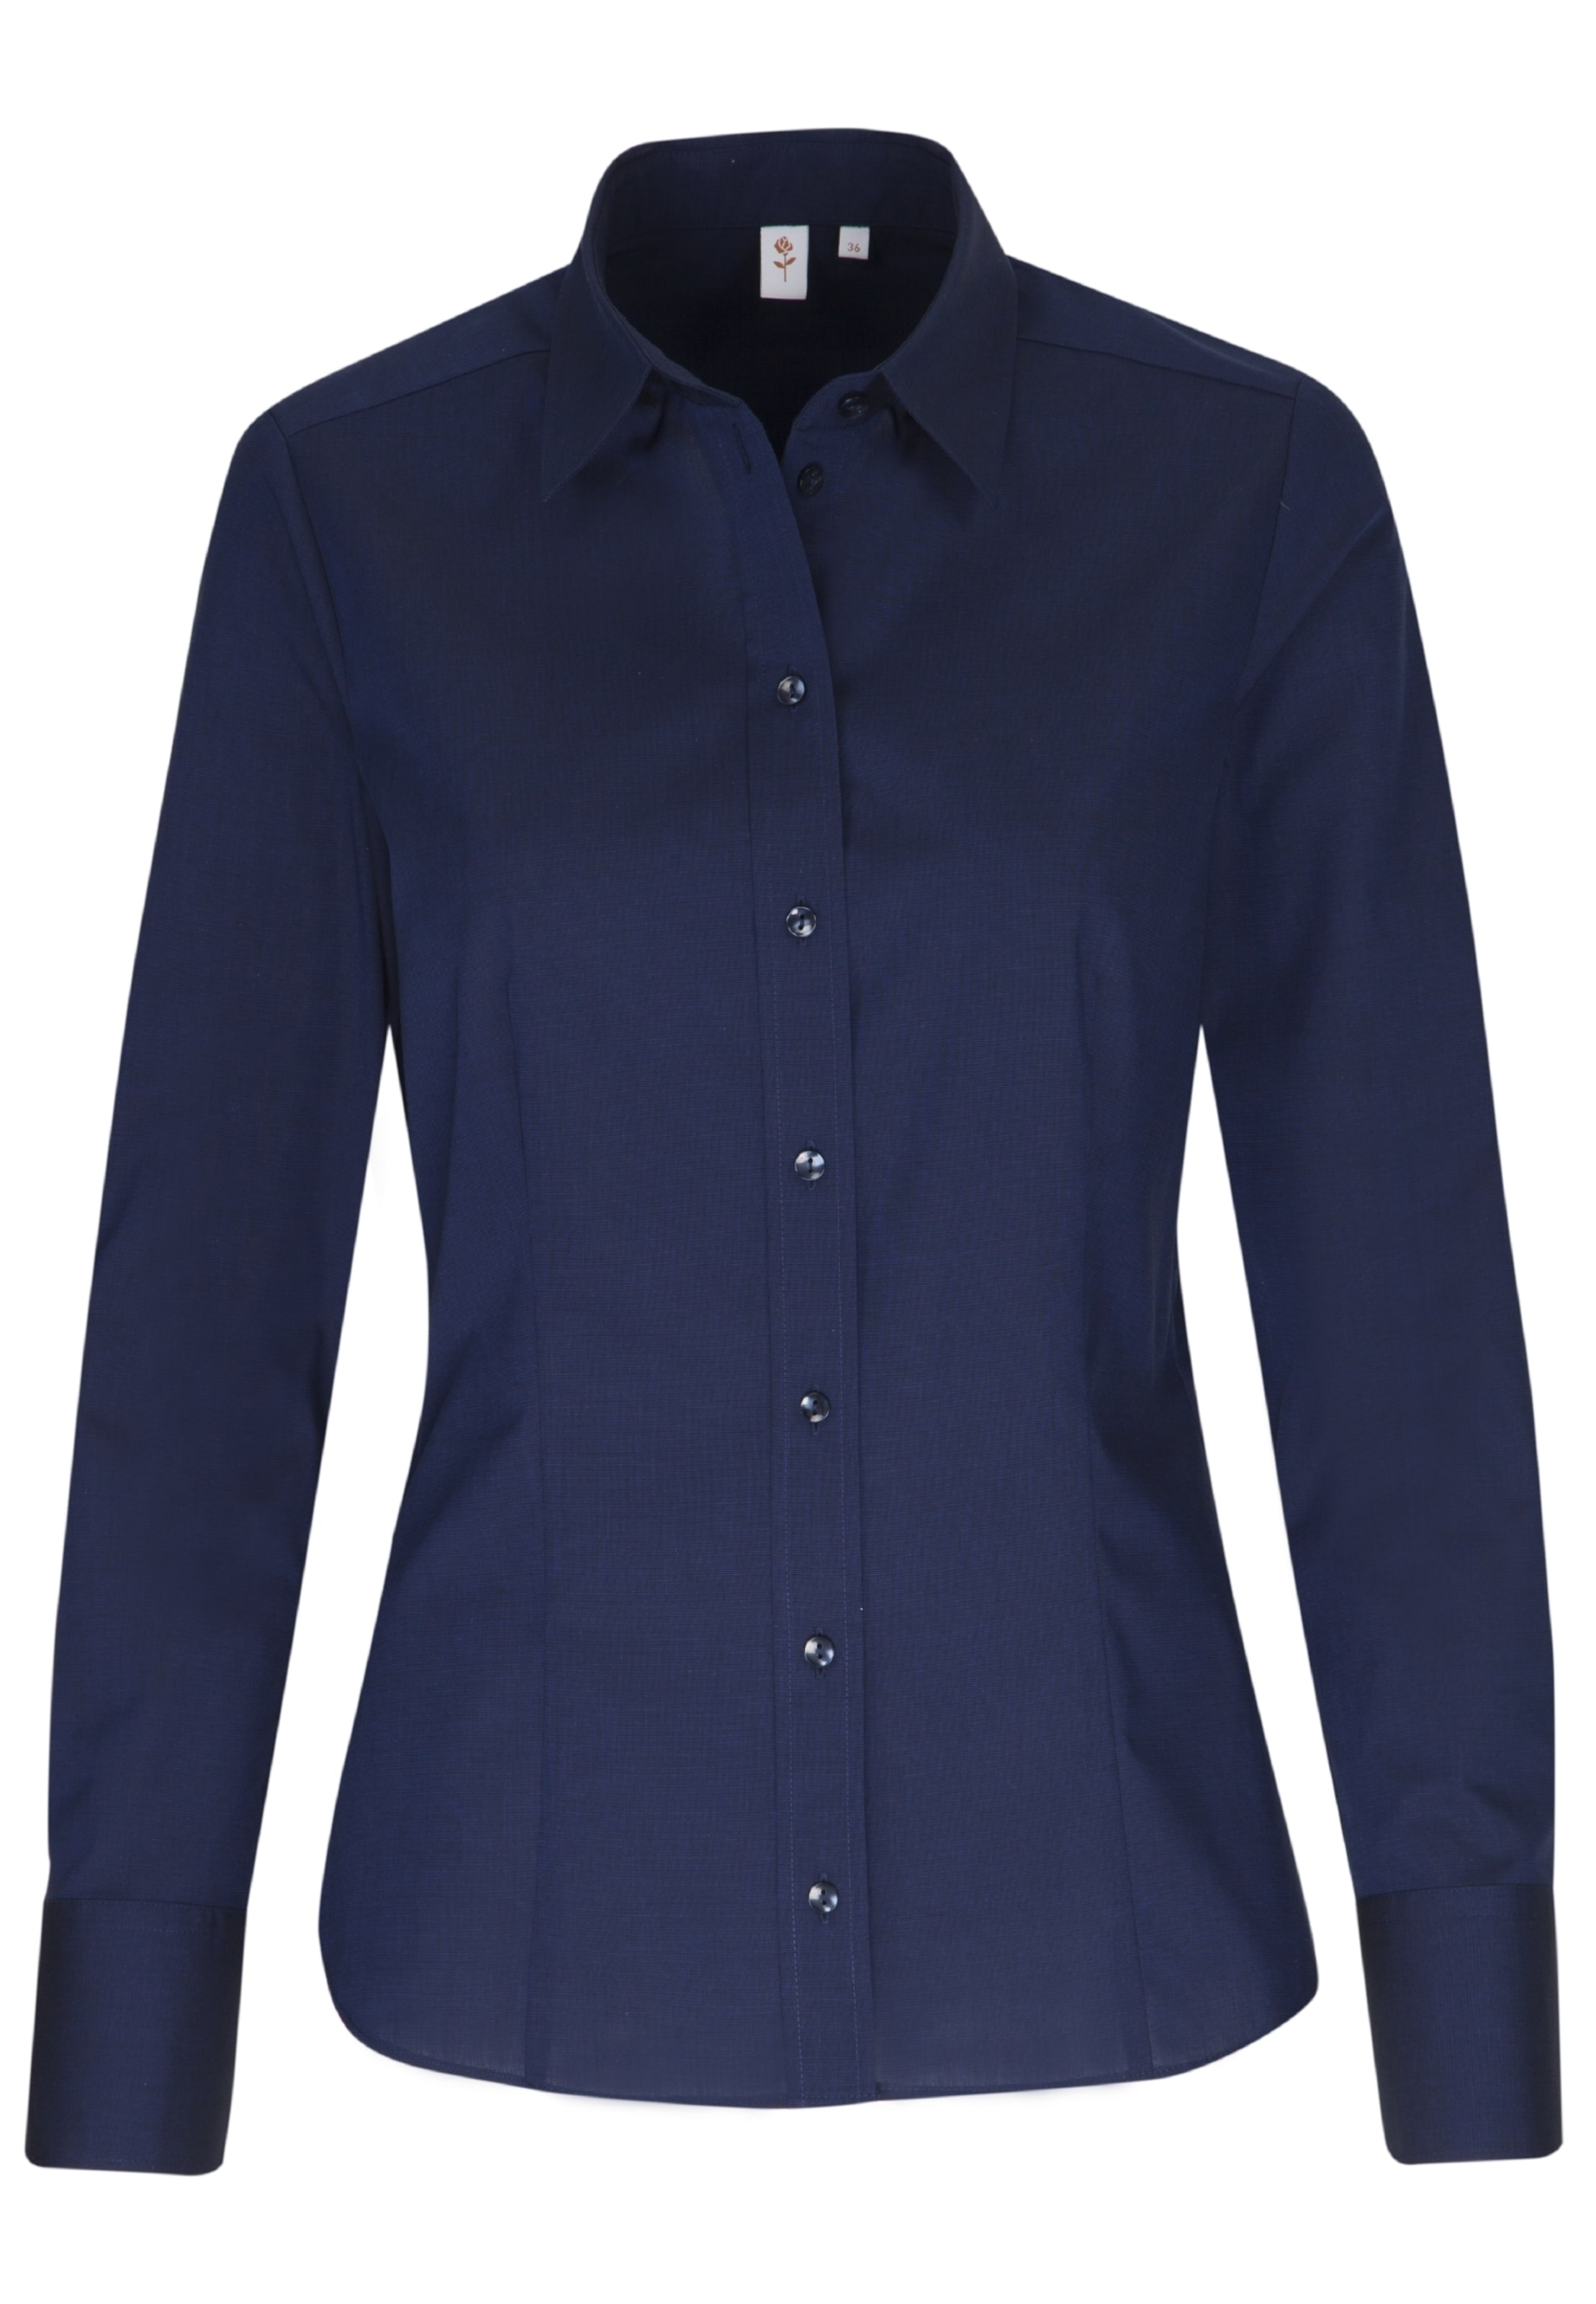 Seidensticker City In bluse Rose' Blau 'schwarze ybgYf6I7mv